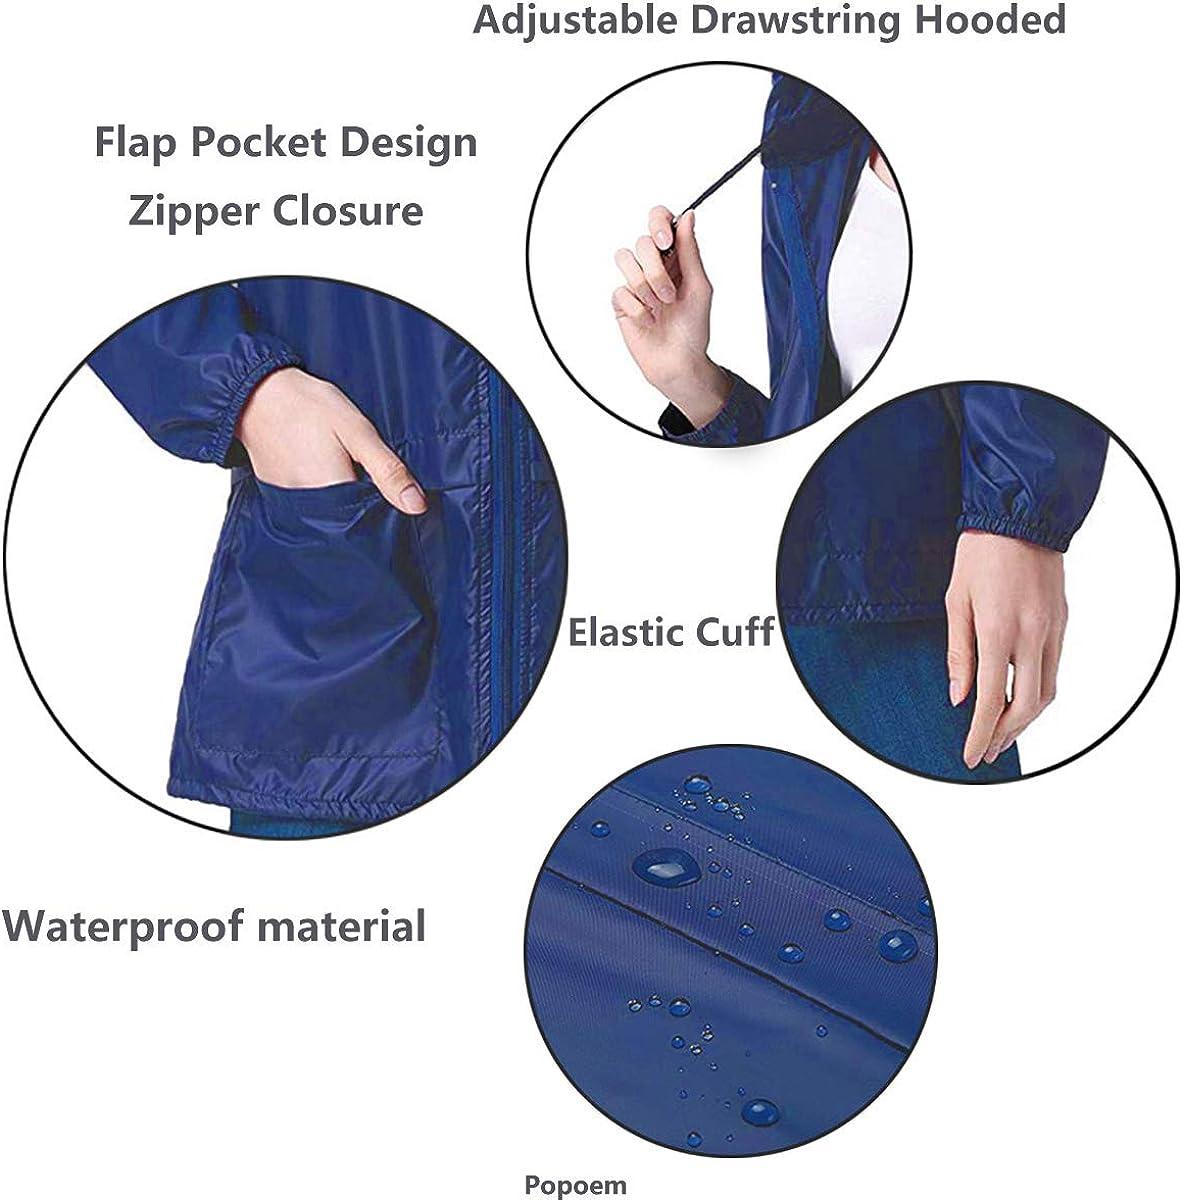 Popoem Womens Lightweight Hooded Rain Jacket Waterproof Raincoat Windbreaker Packable Active Outdoor Zipper Hoodie